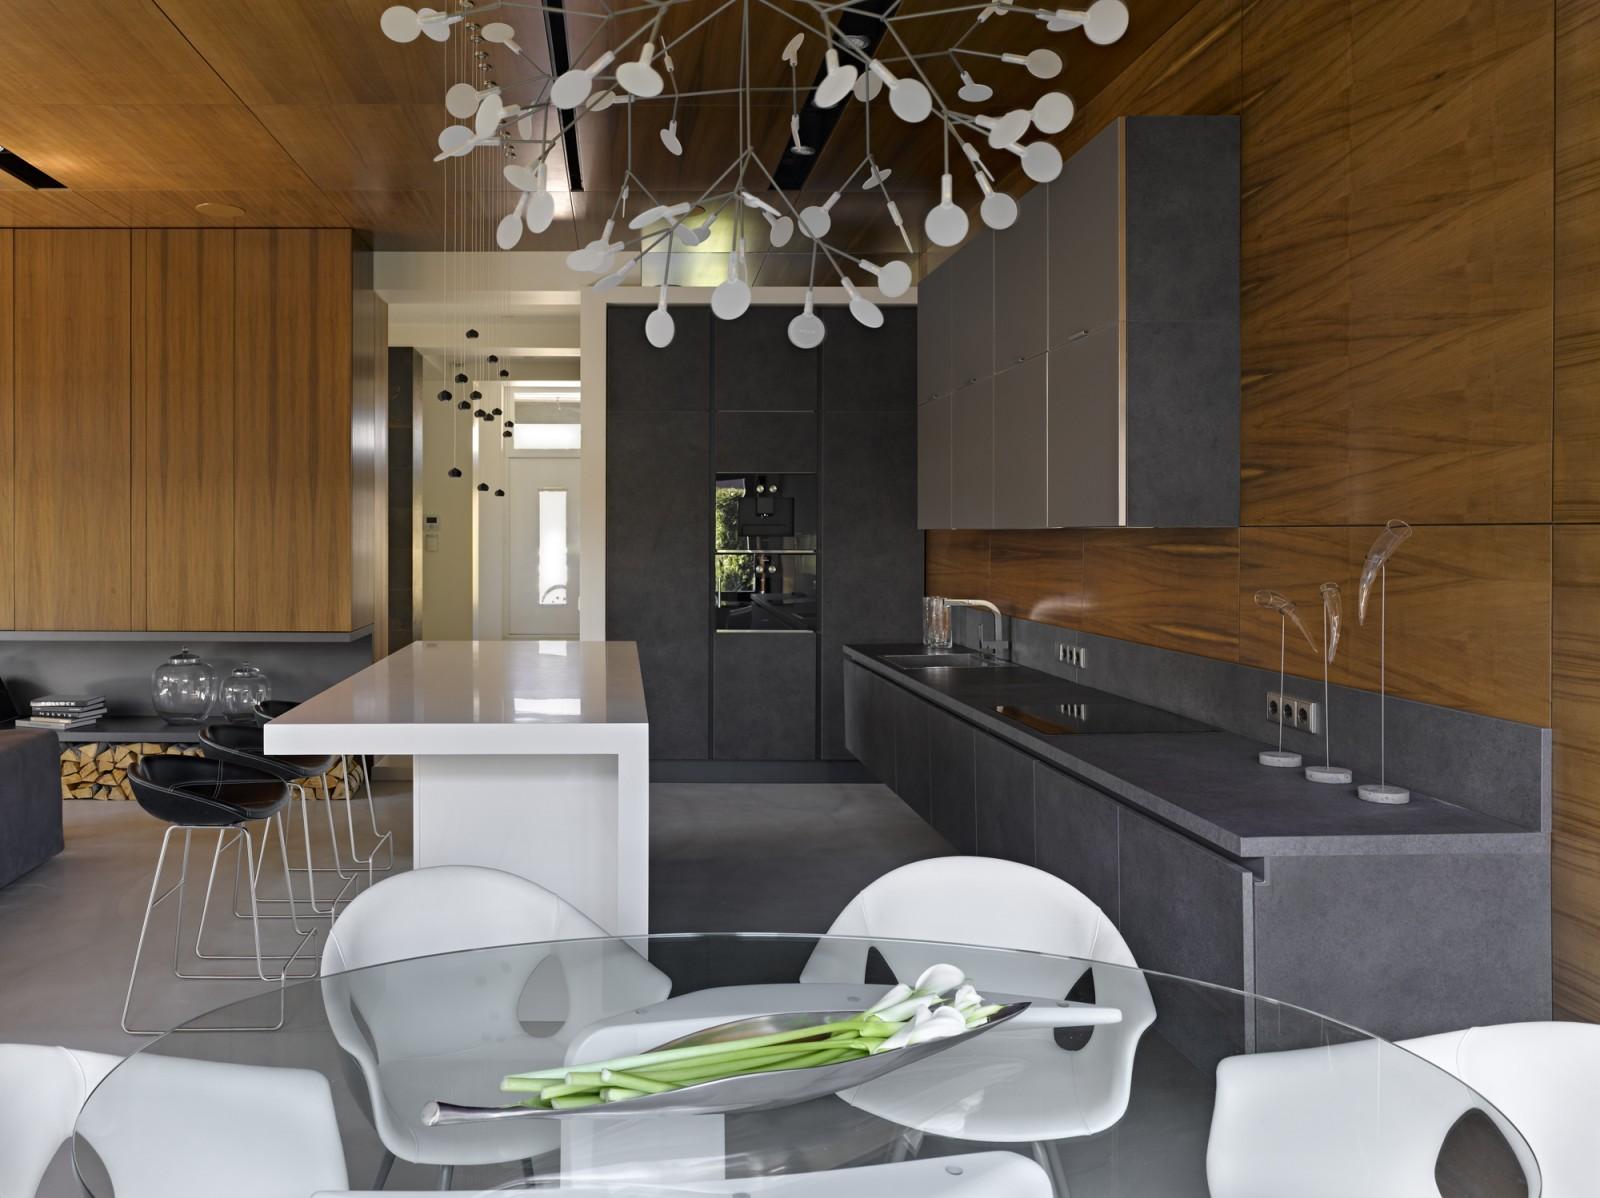 Nice villa interior by architectural Bureau of Alexandra Fedorova - 11